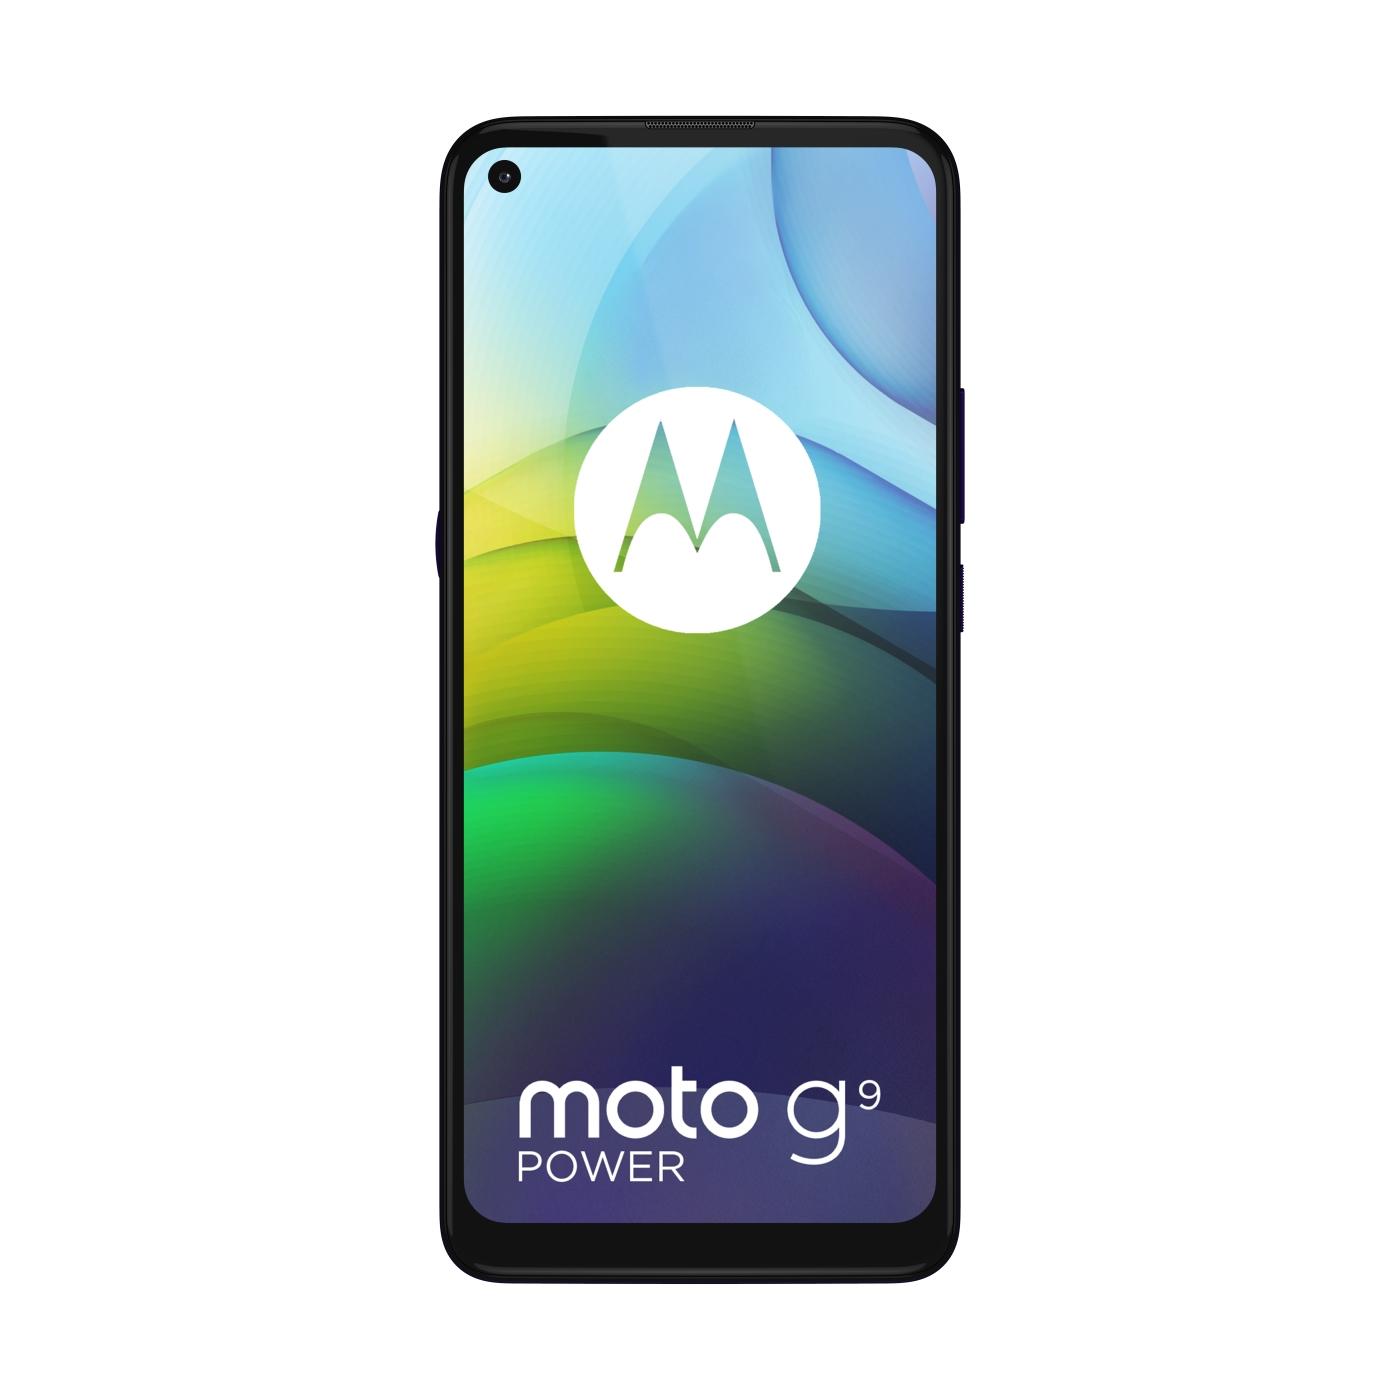 web-moto-g9-power-basicpack-electric-violet-frontside-1